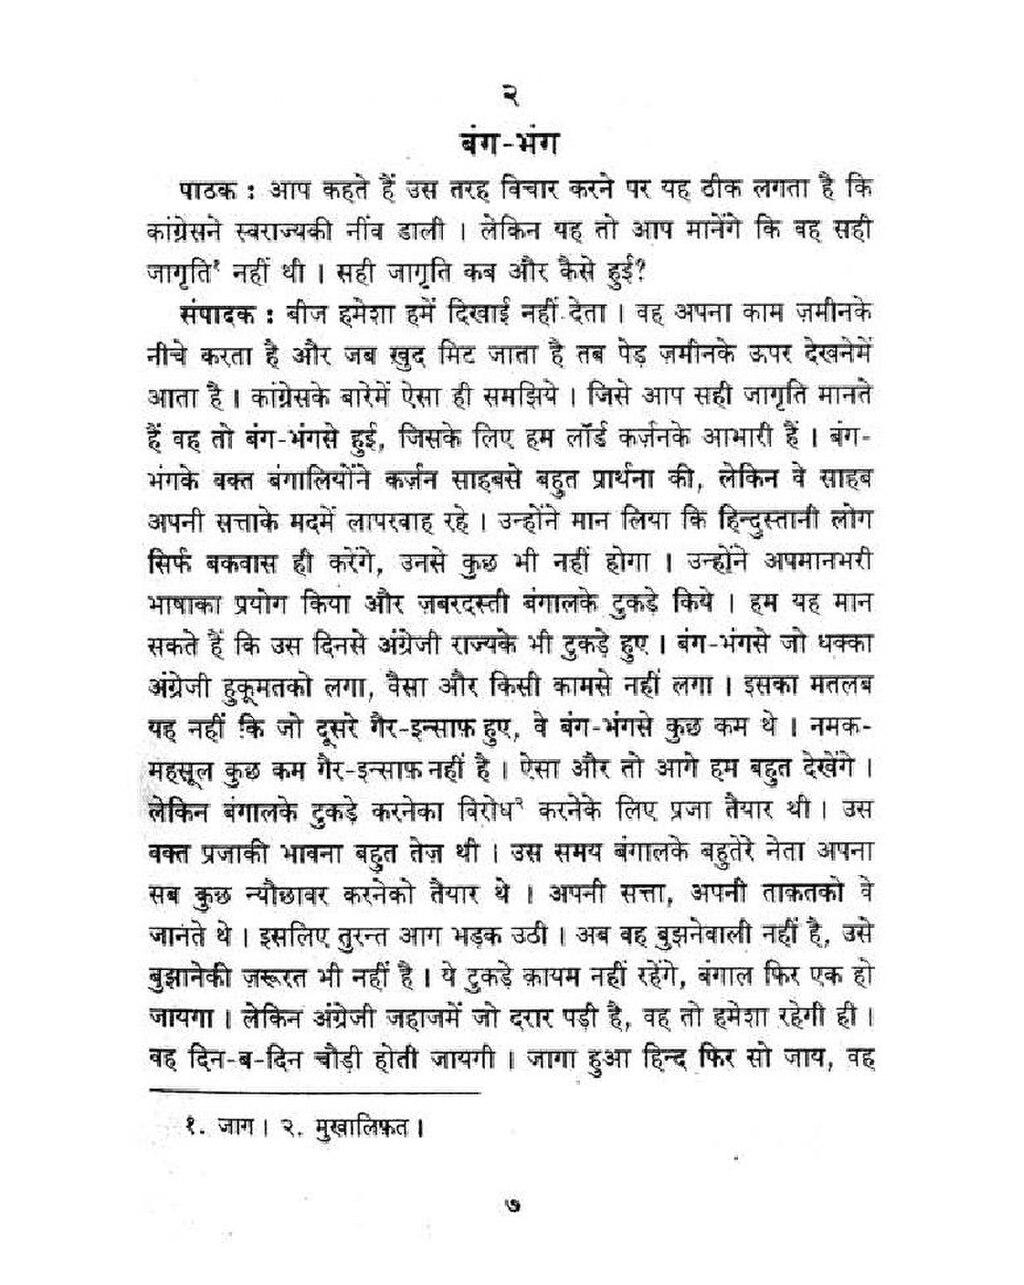 Hind Swaraj Pdf In Hindi